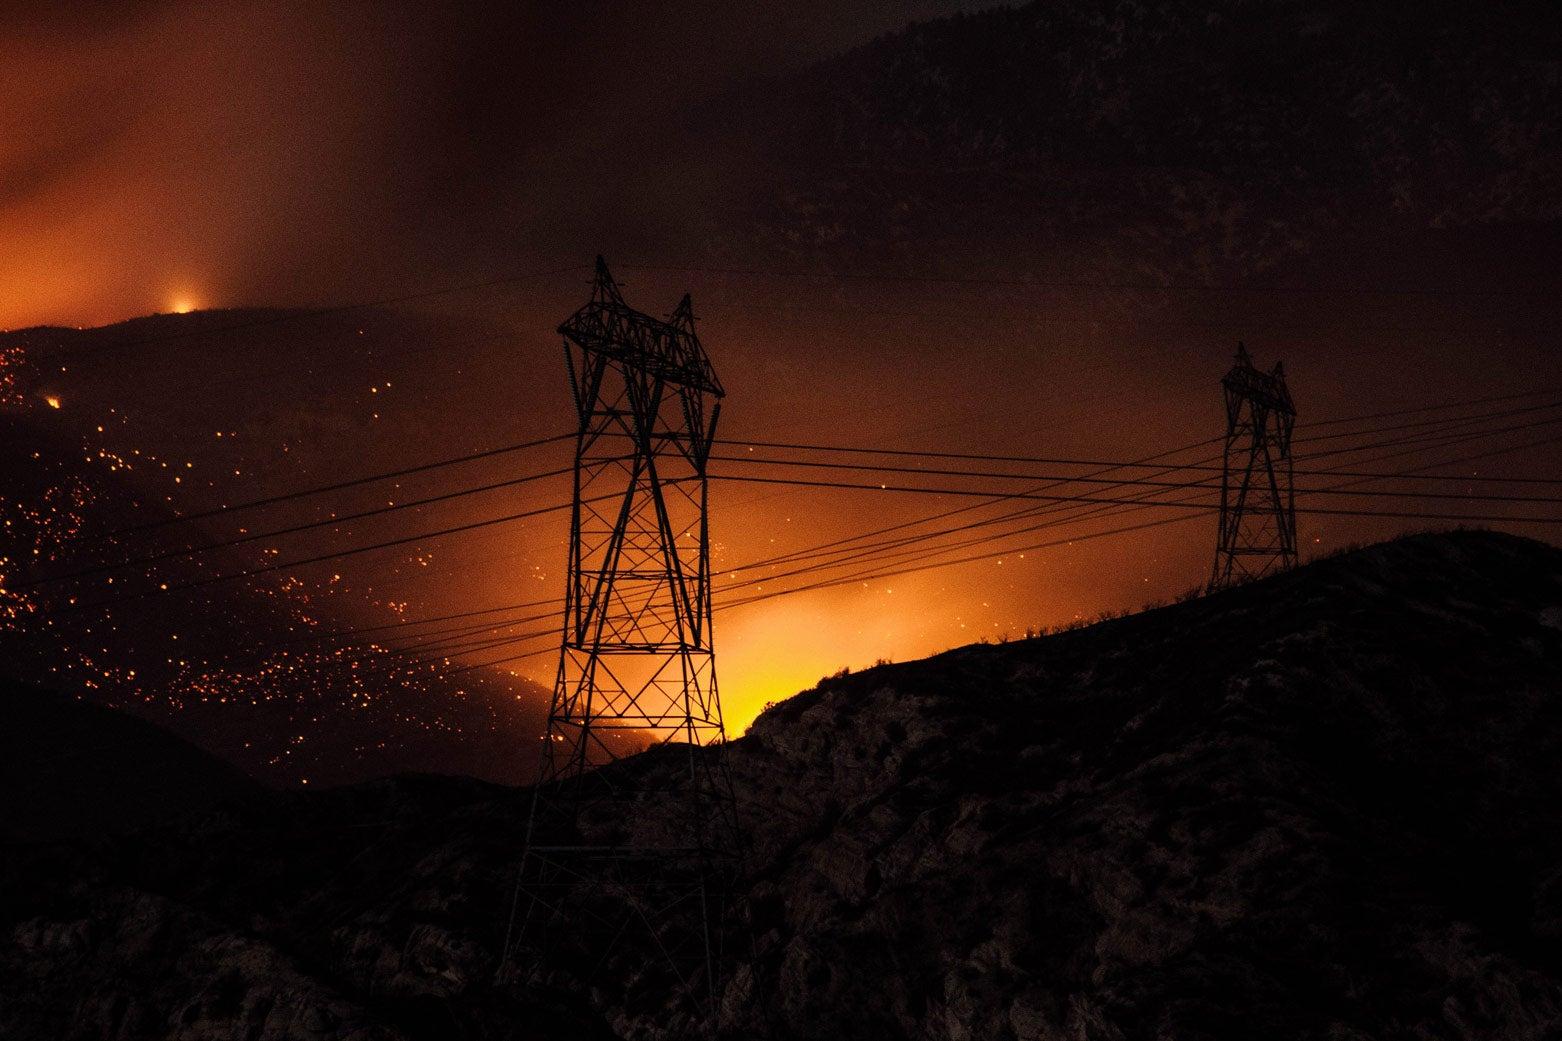 A wildfire burns near power lines.